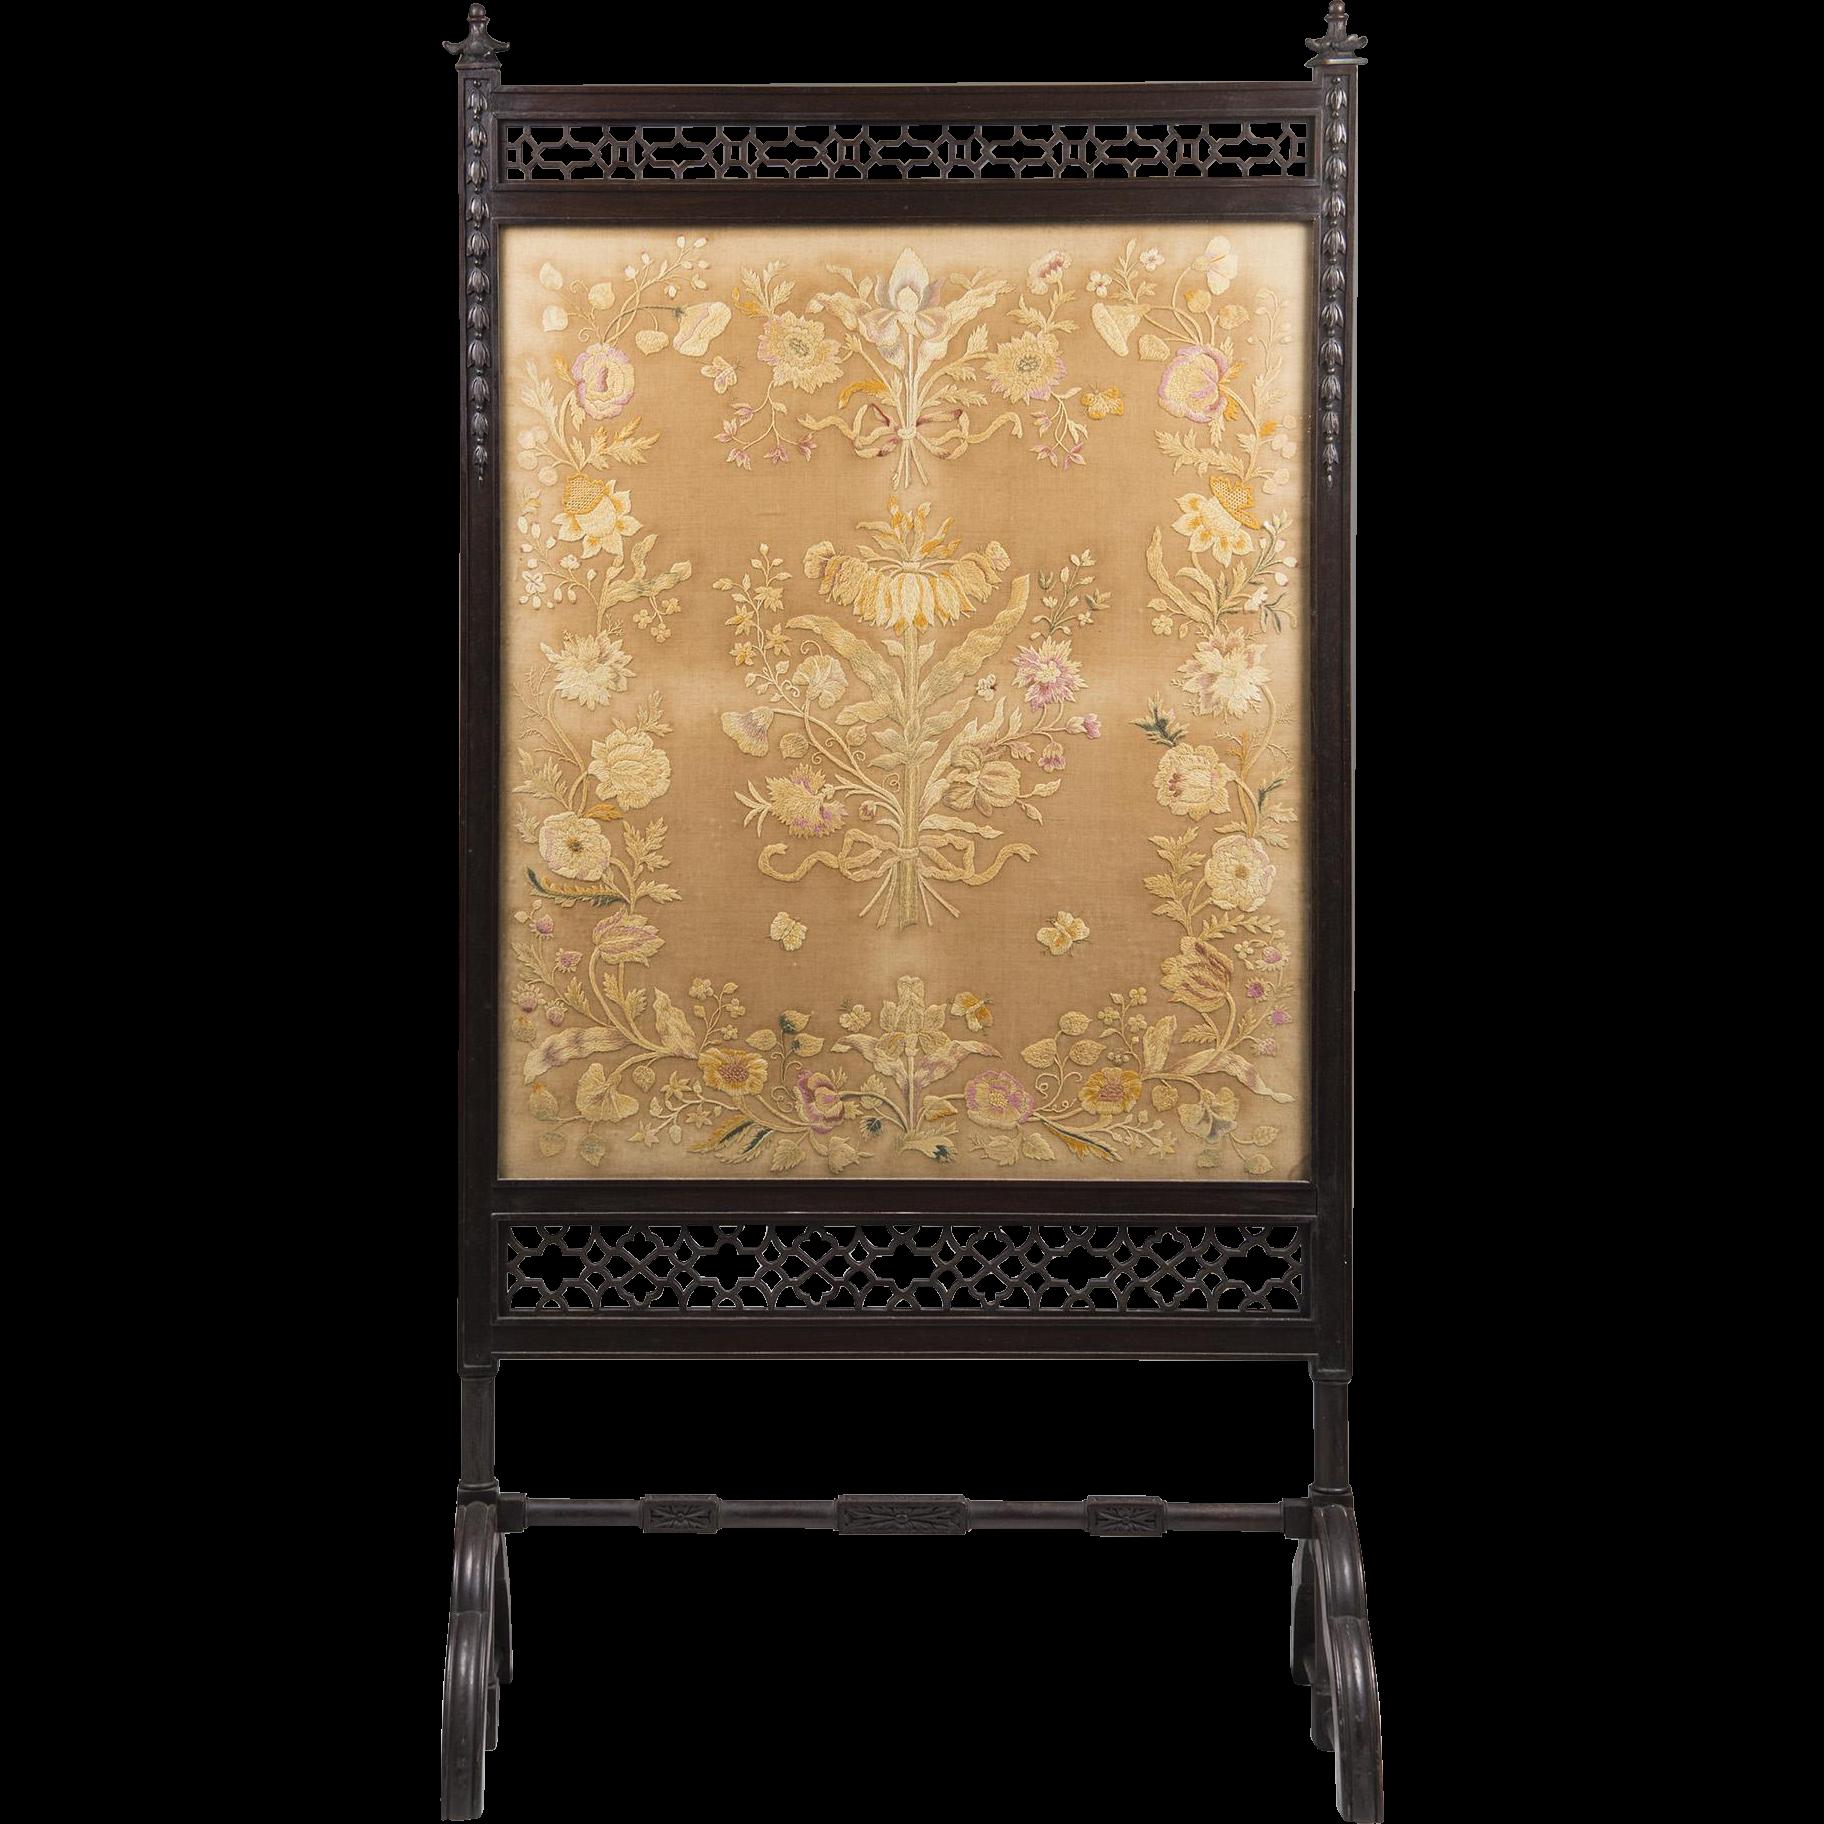 Period English Aesthetic Movement Floor Screen, Japanese Silk Insert